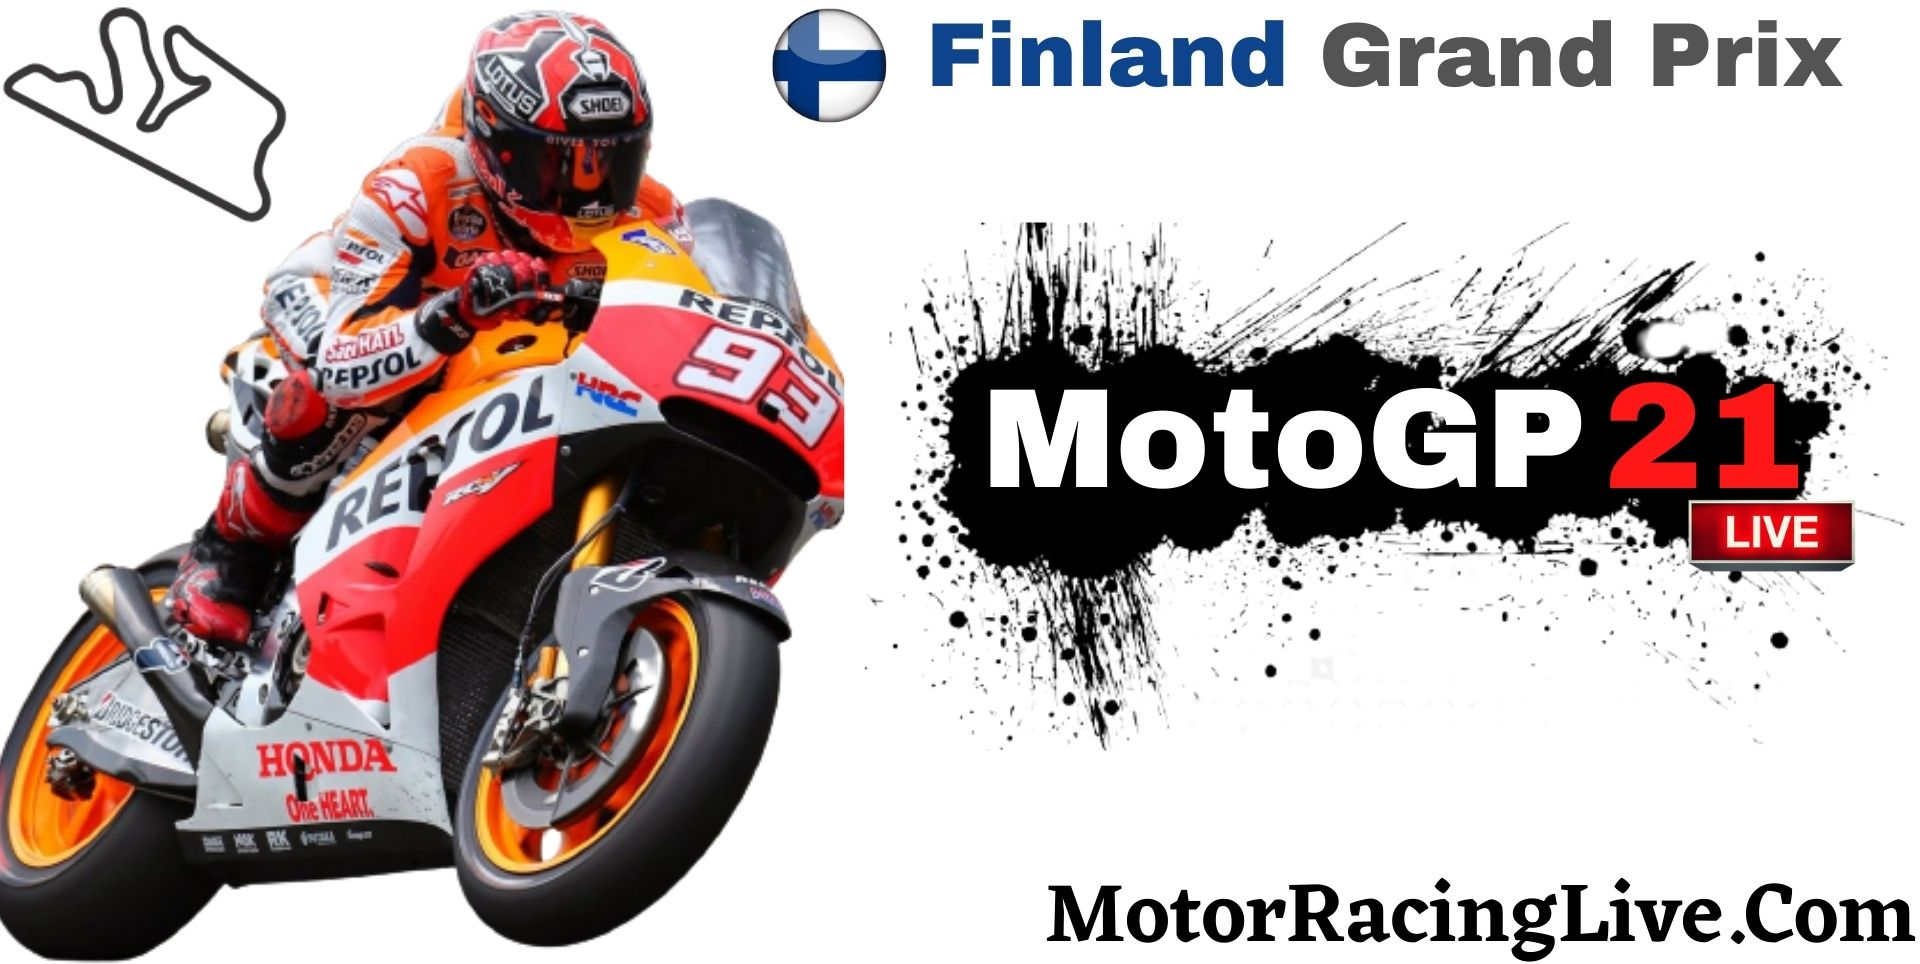 Finland Grand Prix MotoGP 2021 Live Stream | Full Race Replay